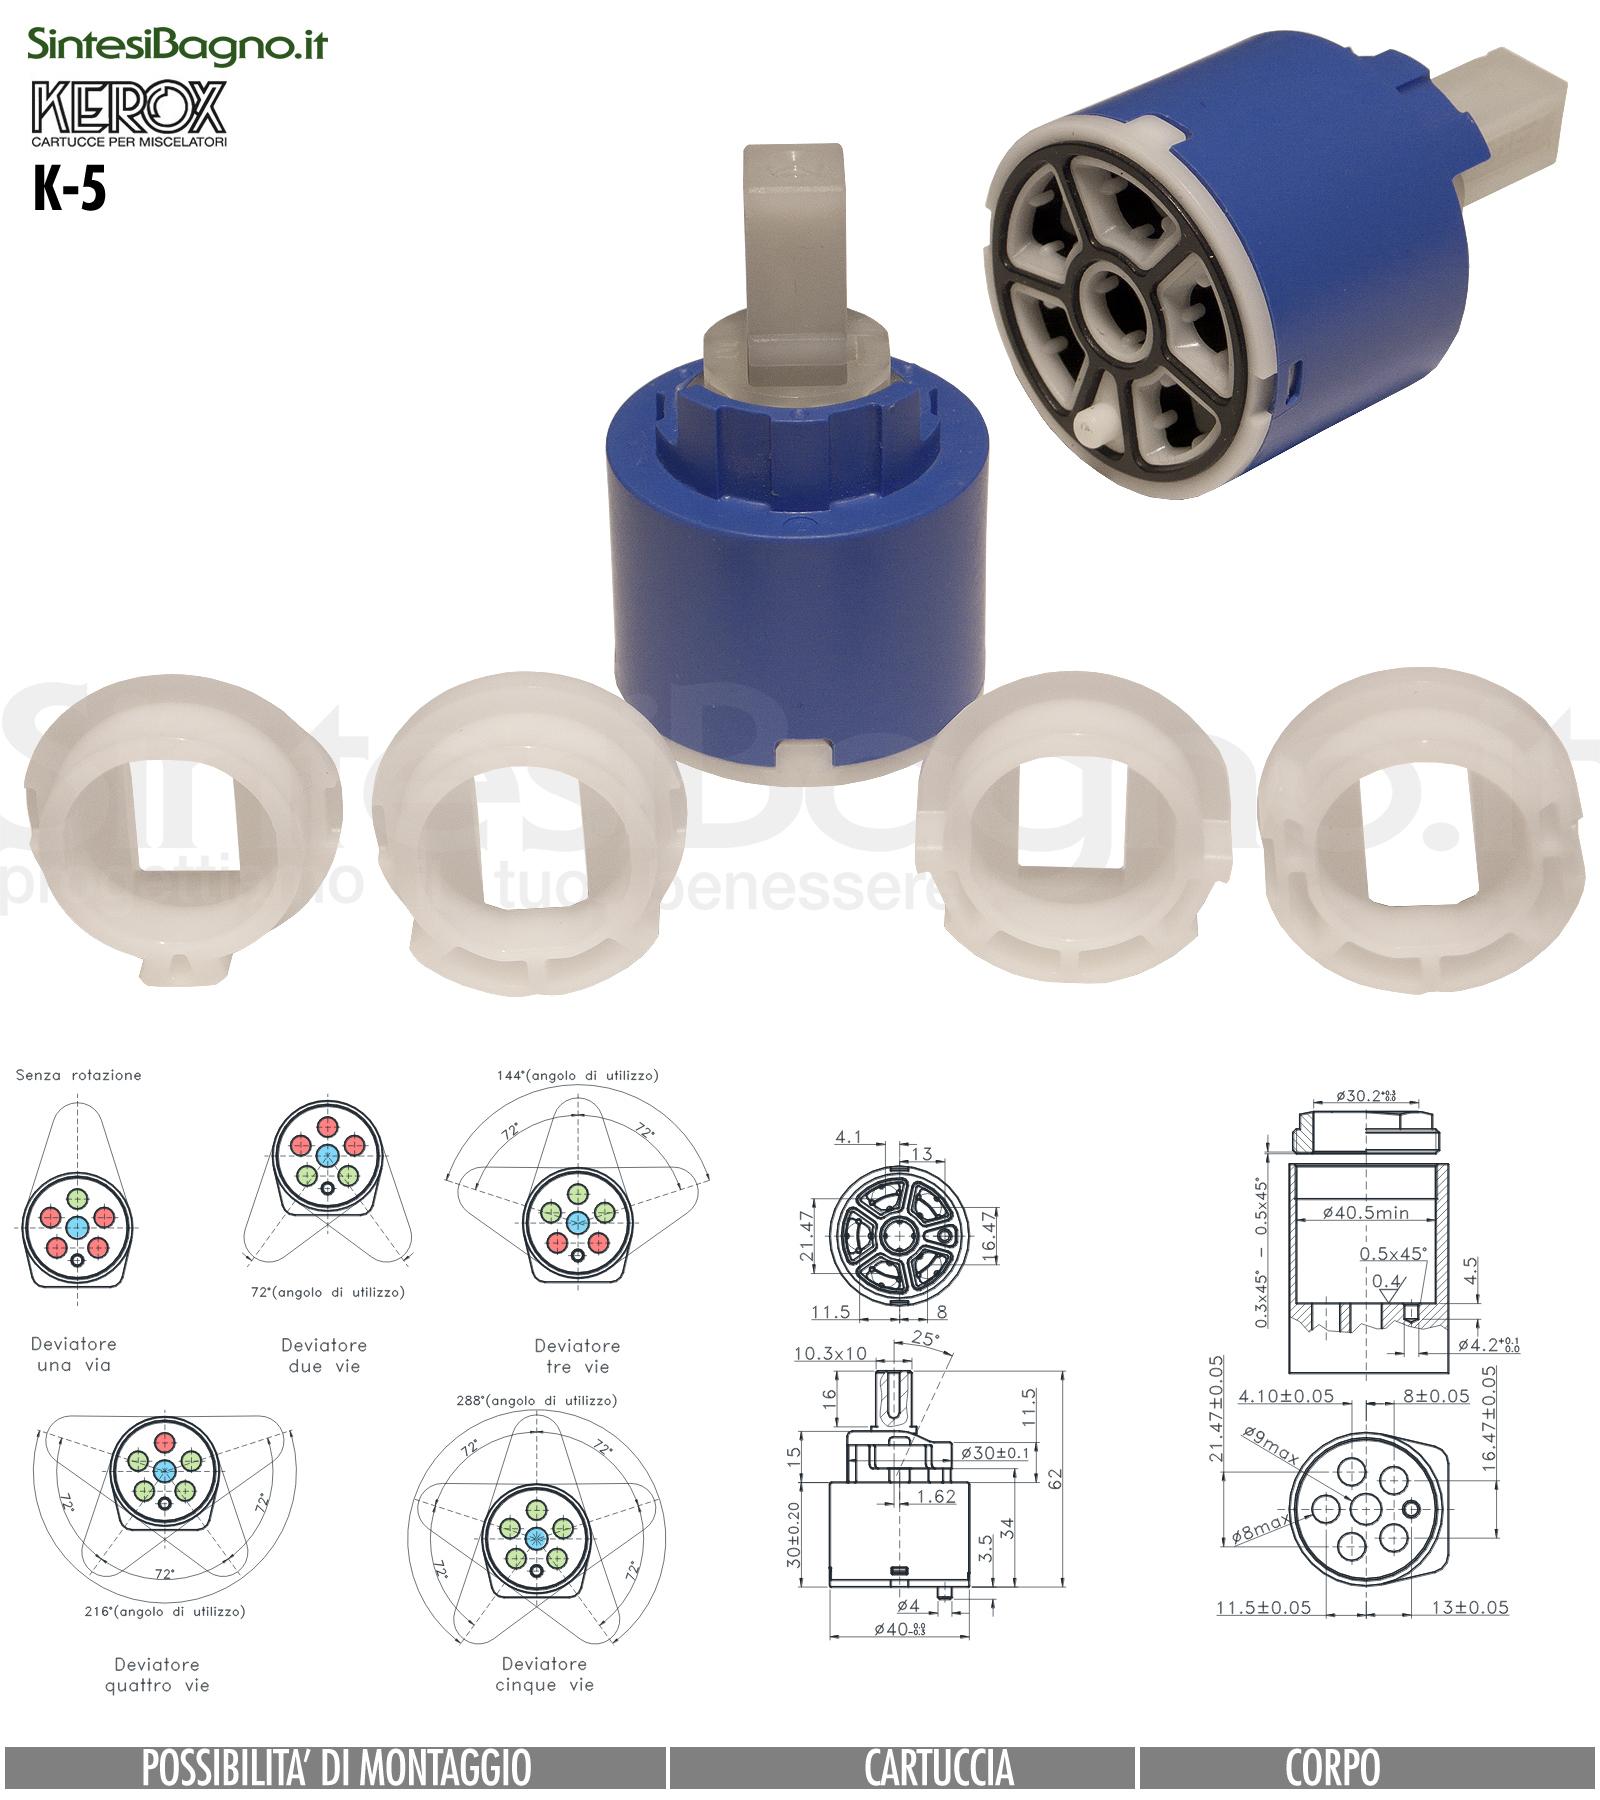 KEROX K 5VC | Cartuccia DEVIATRICE/DEVIATORE a 5 vie con chiusura KEROX K-5VC | Ø 40 mm